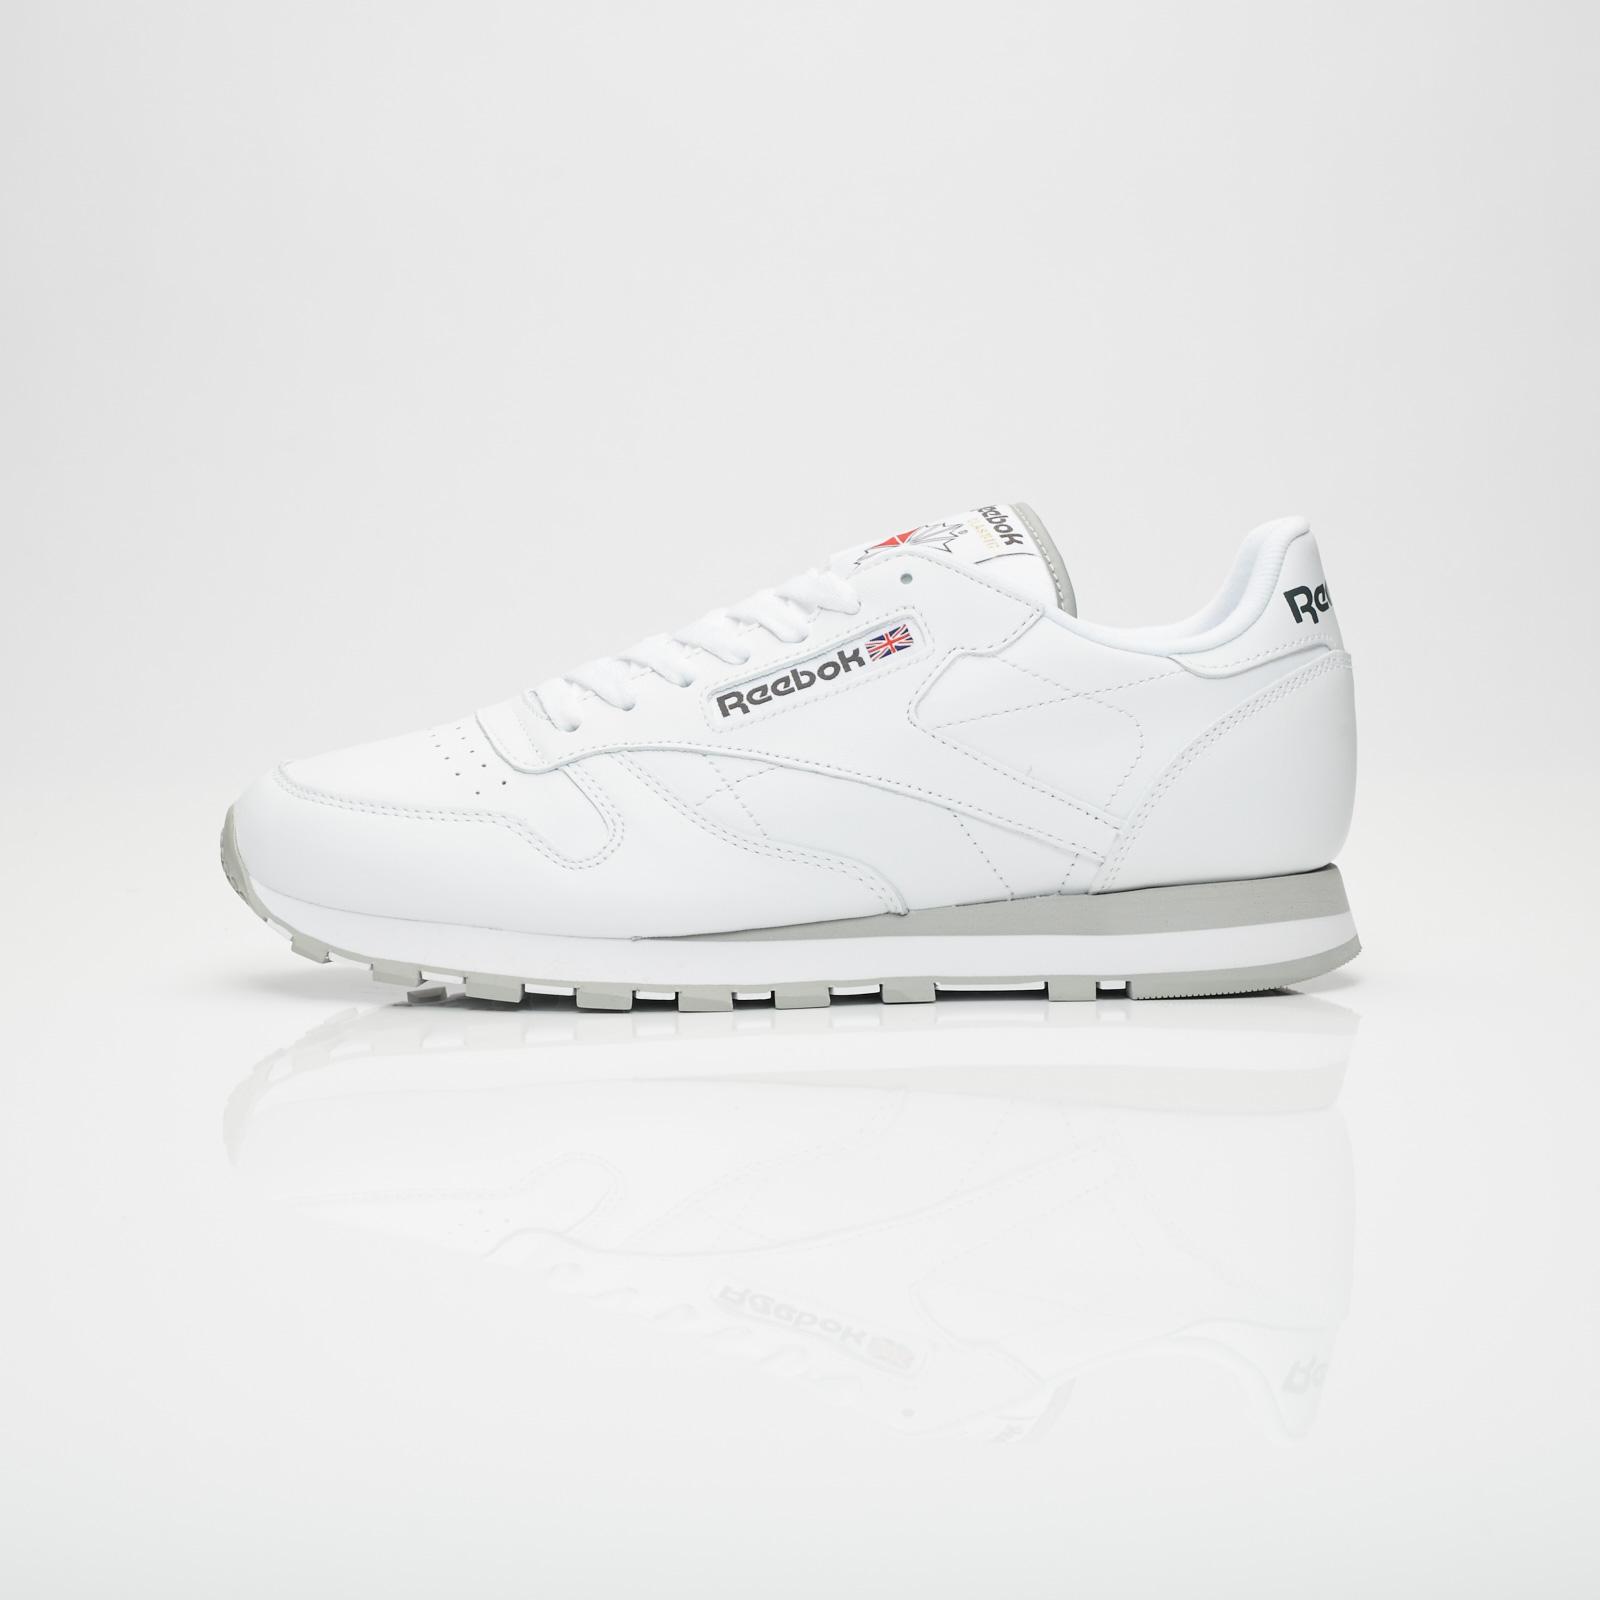 6aa571b4a4acc Reebok Classic Leather - 2214 - Sneakersnstuff